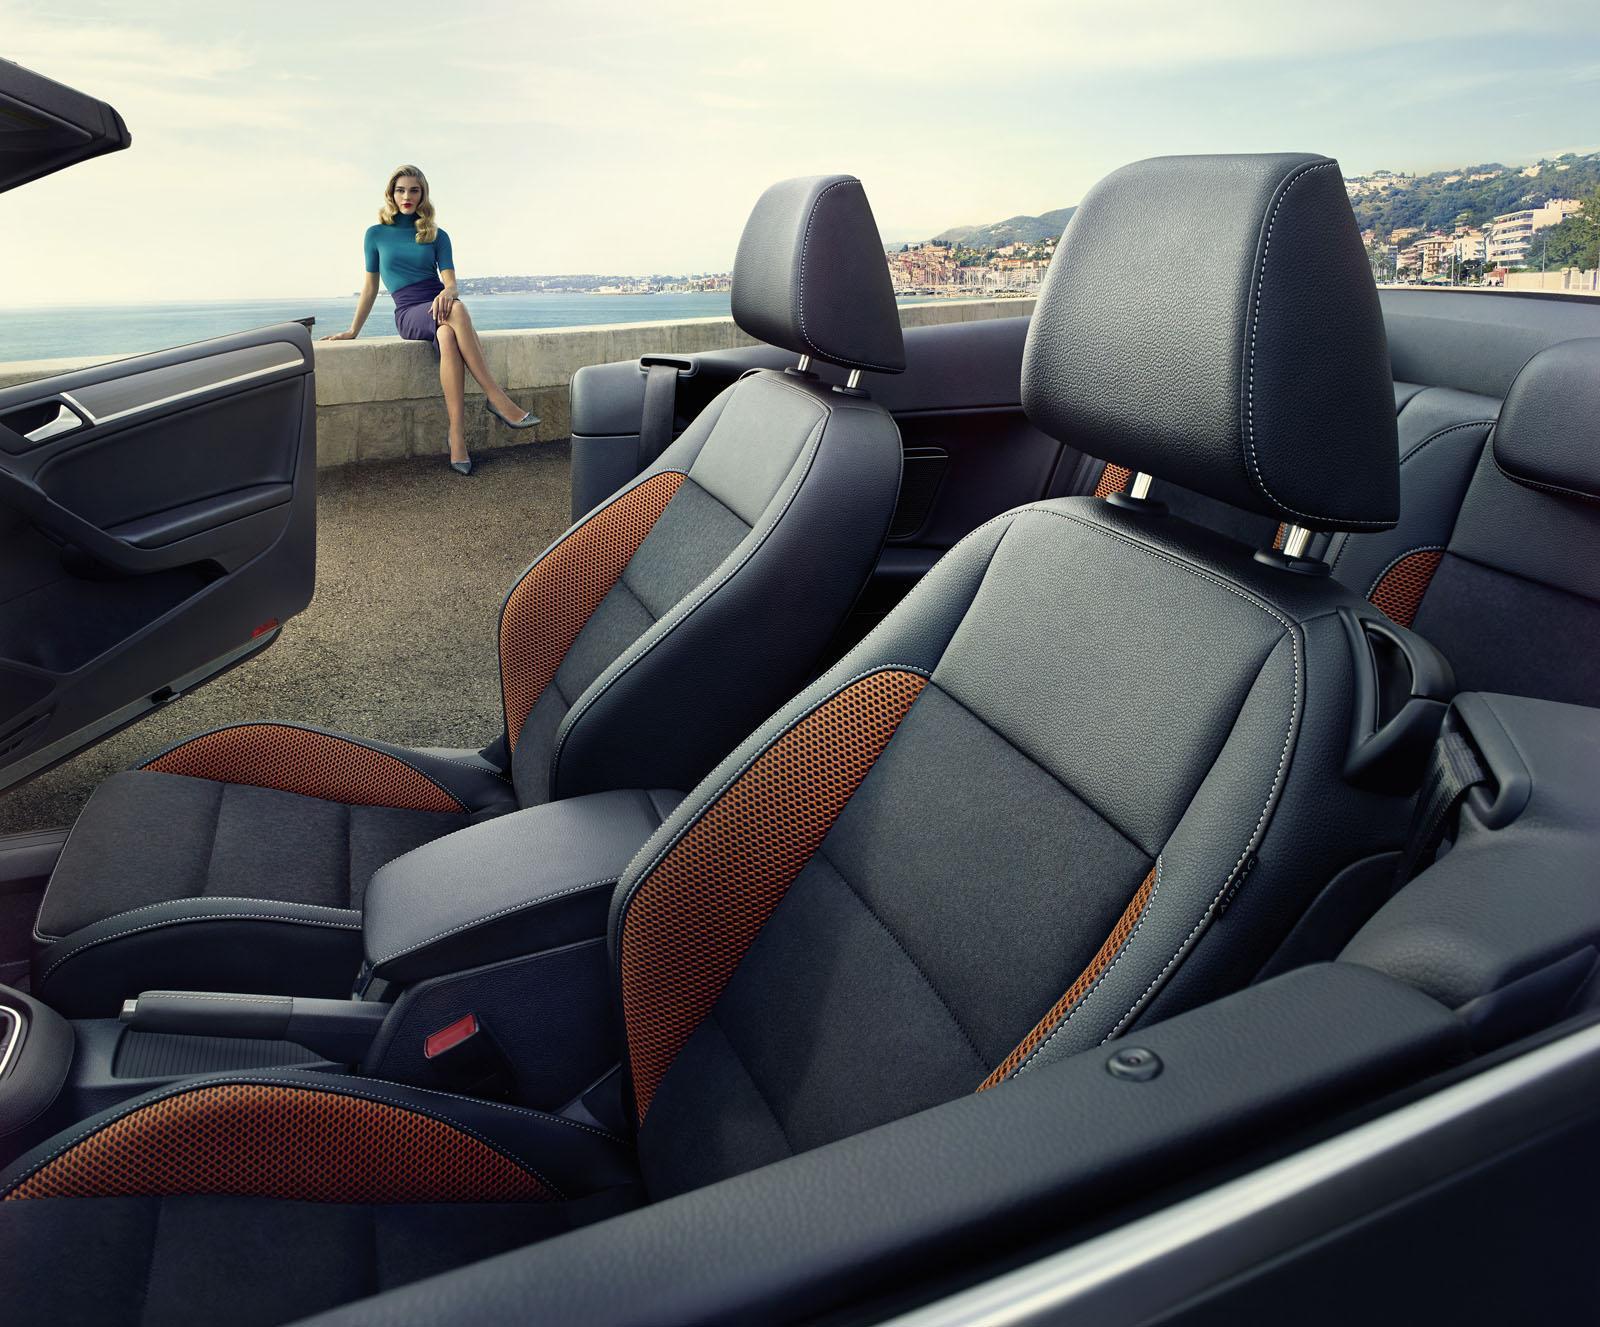 volkswagen lance une s rie sp ciale golf cabriolet karmann. Black Bedroom Furniture Sets. Home Design Ideas